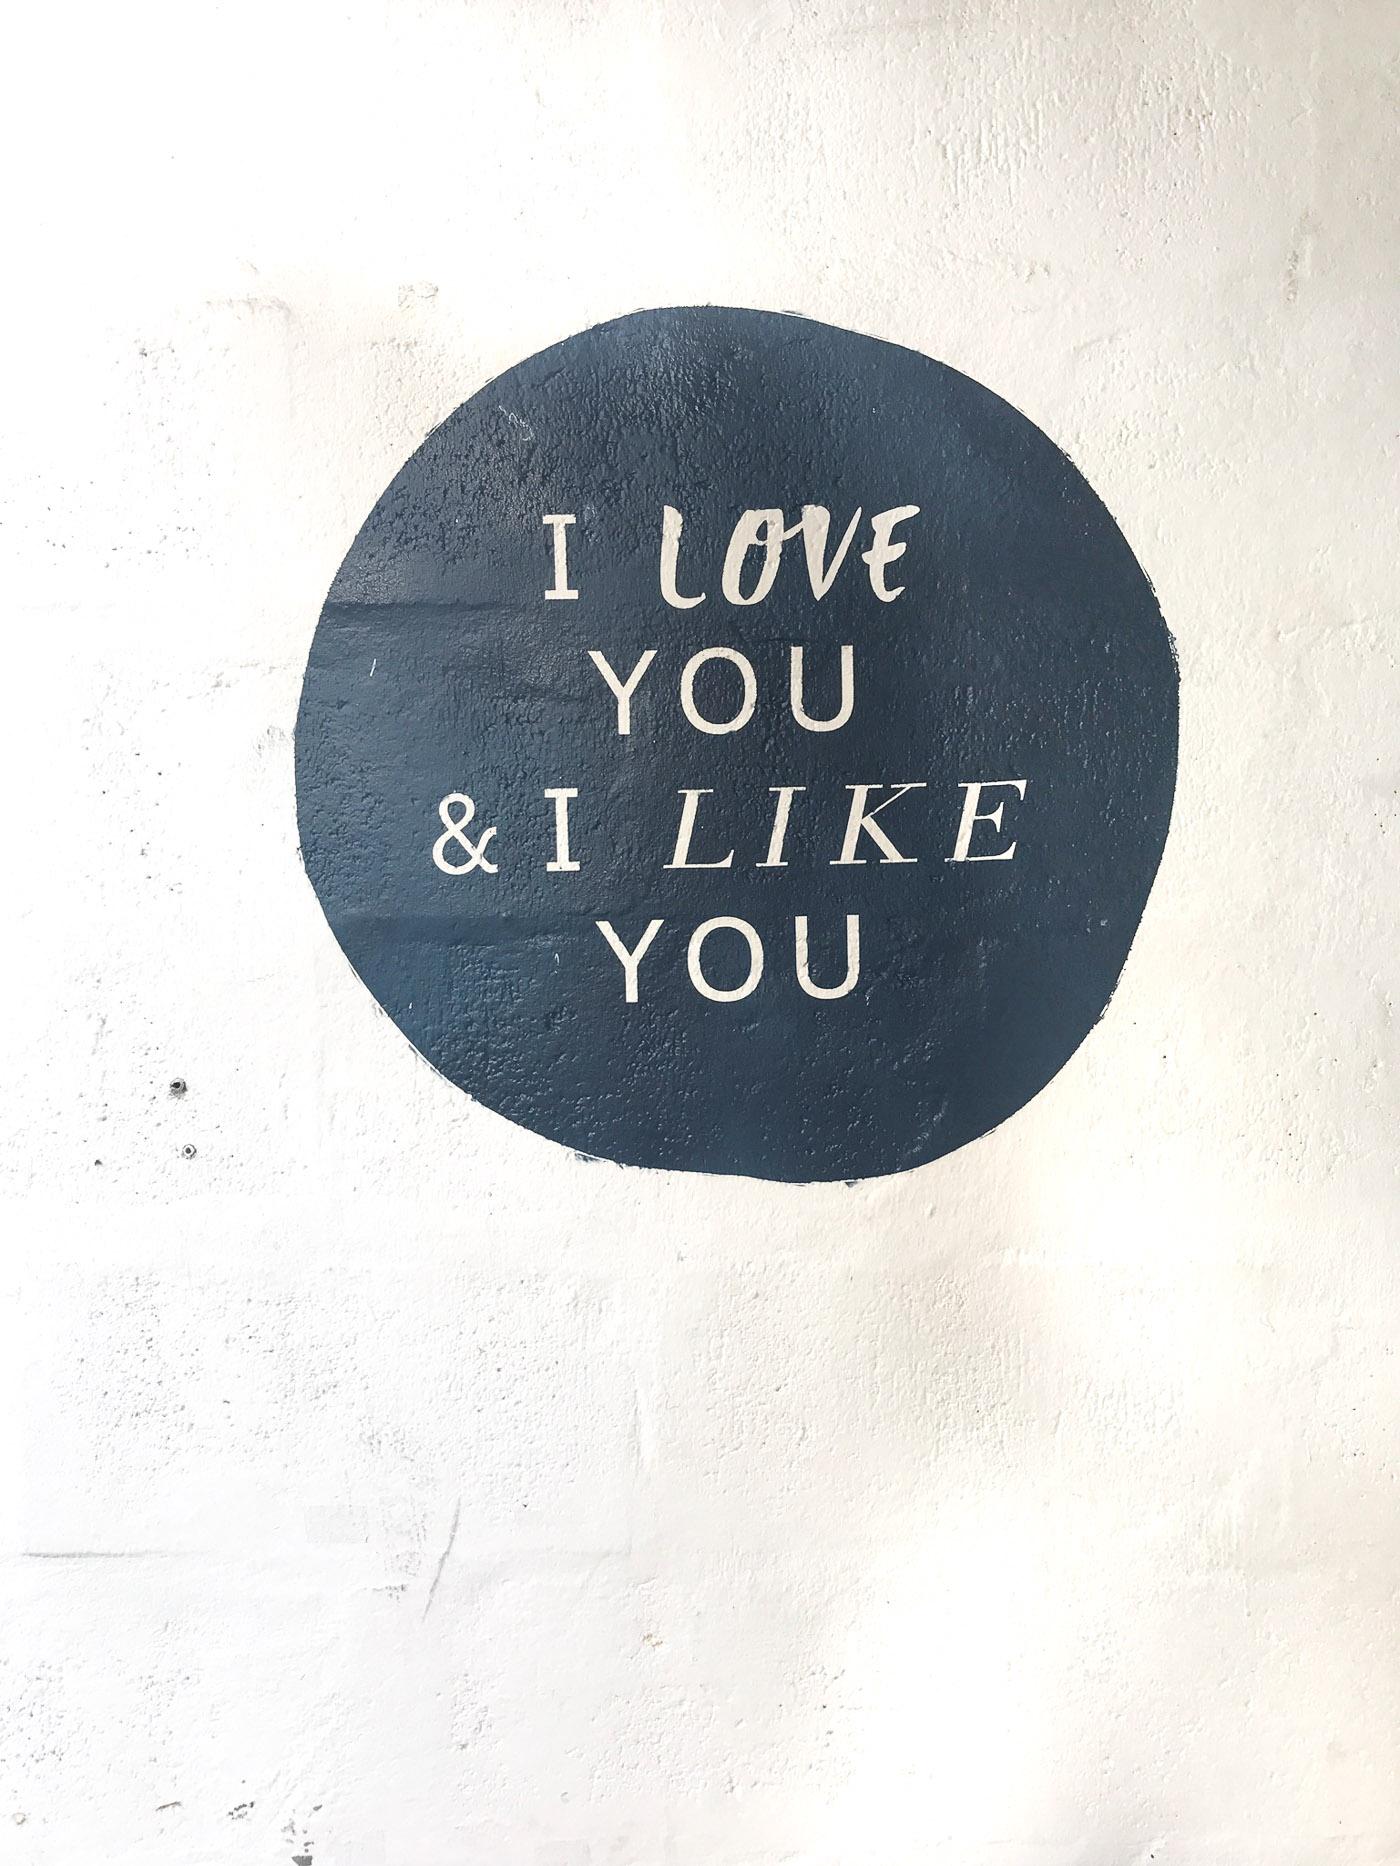 I love you & I like you quote